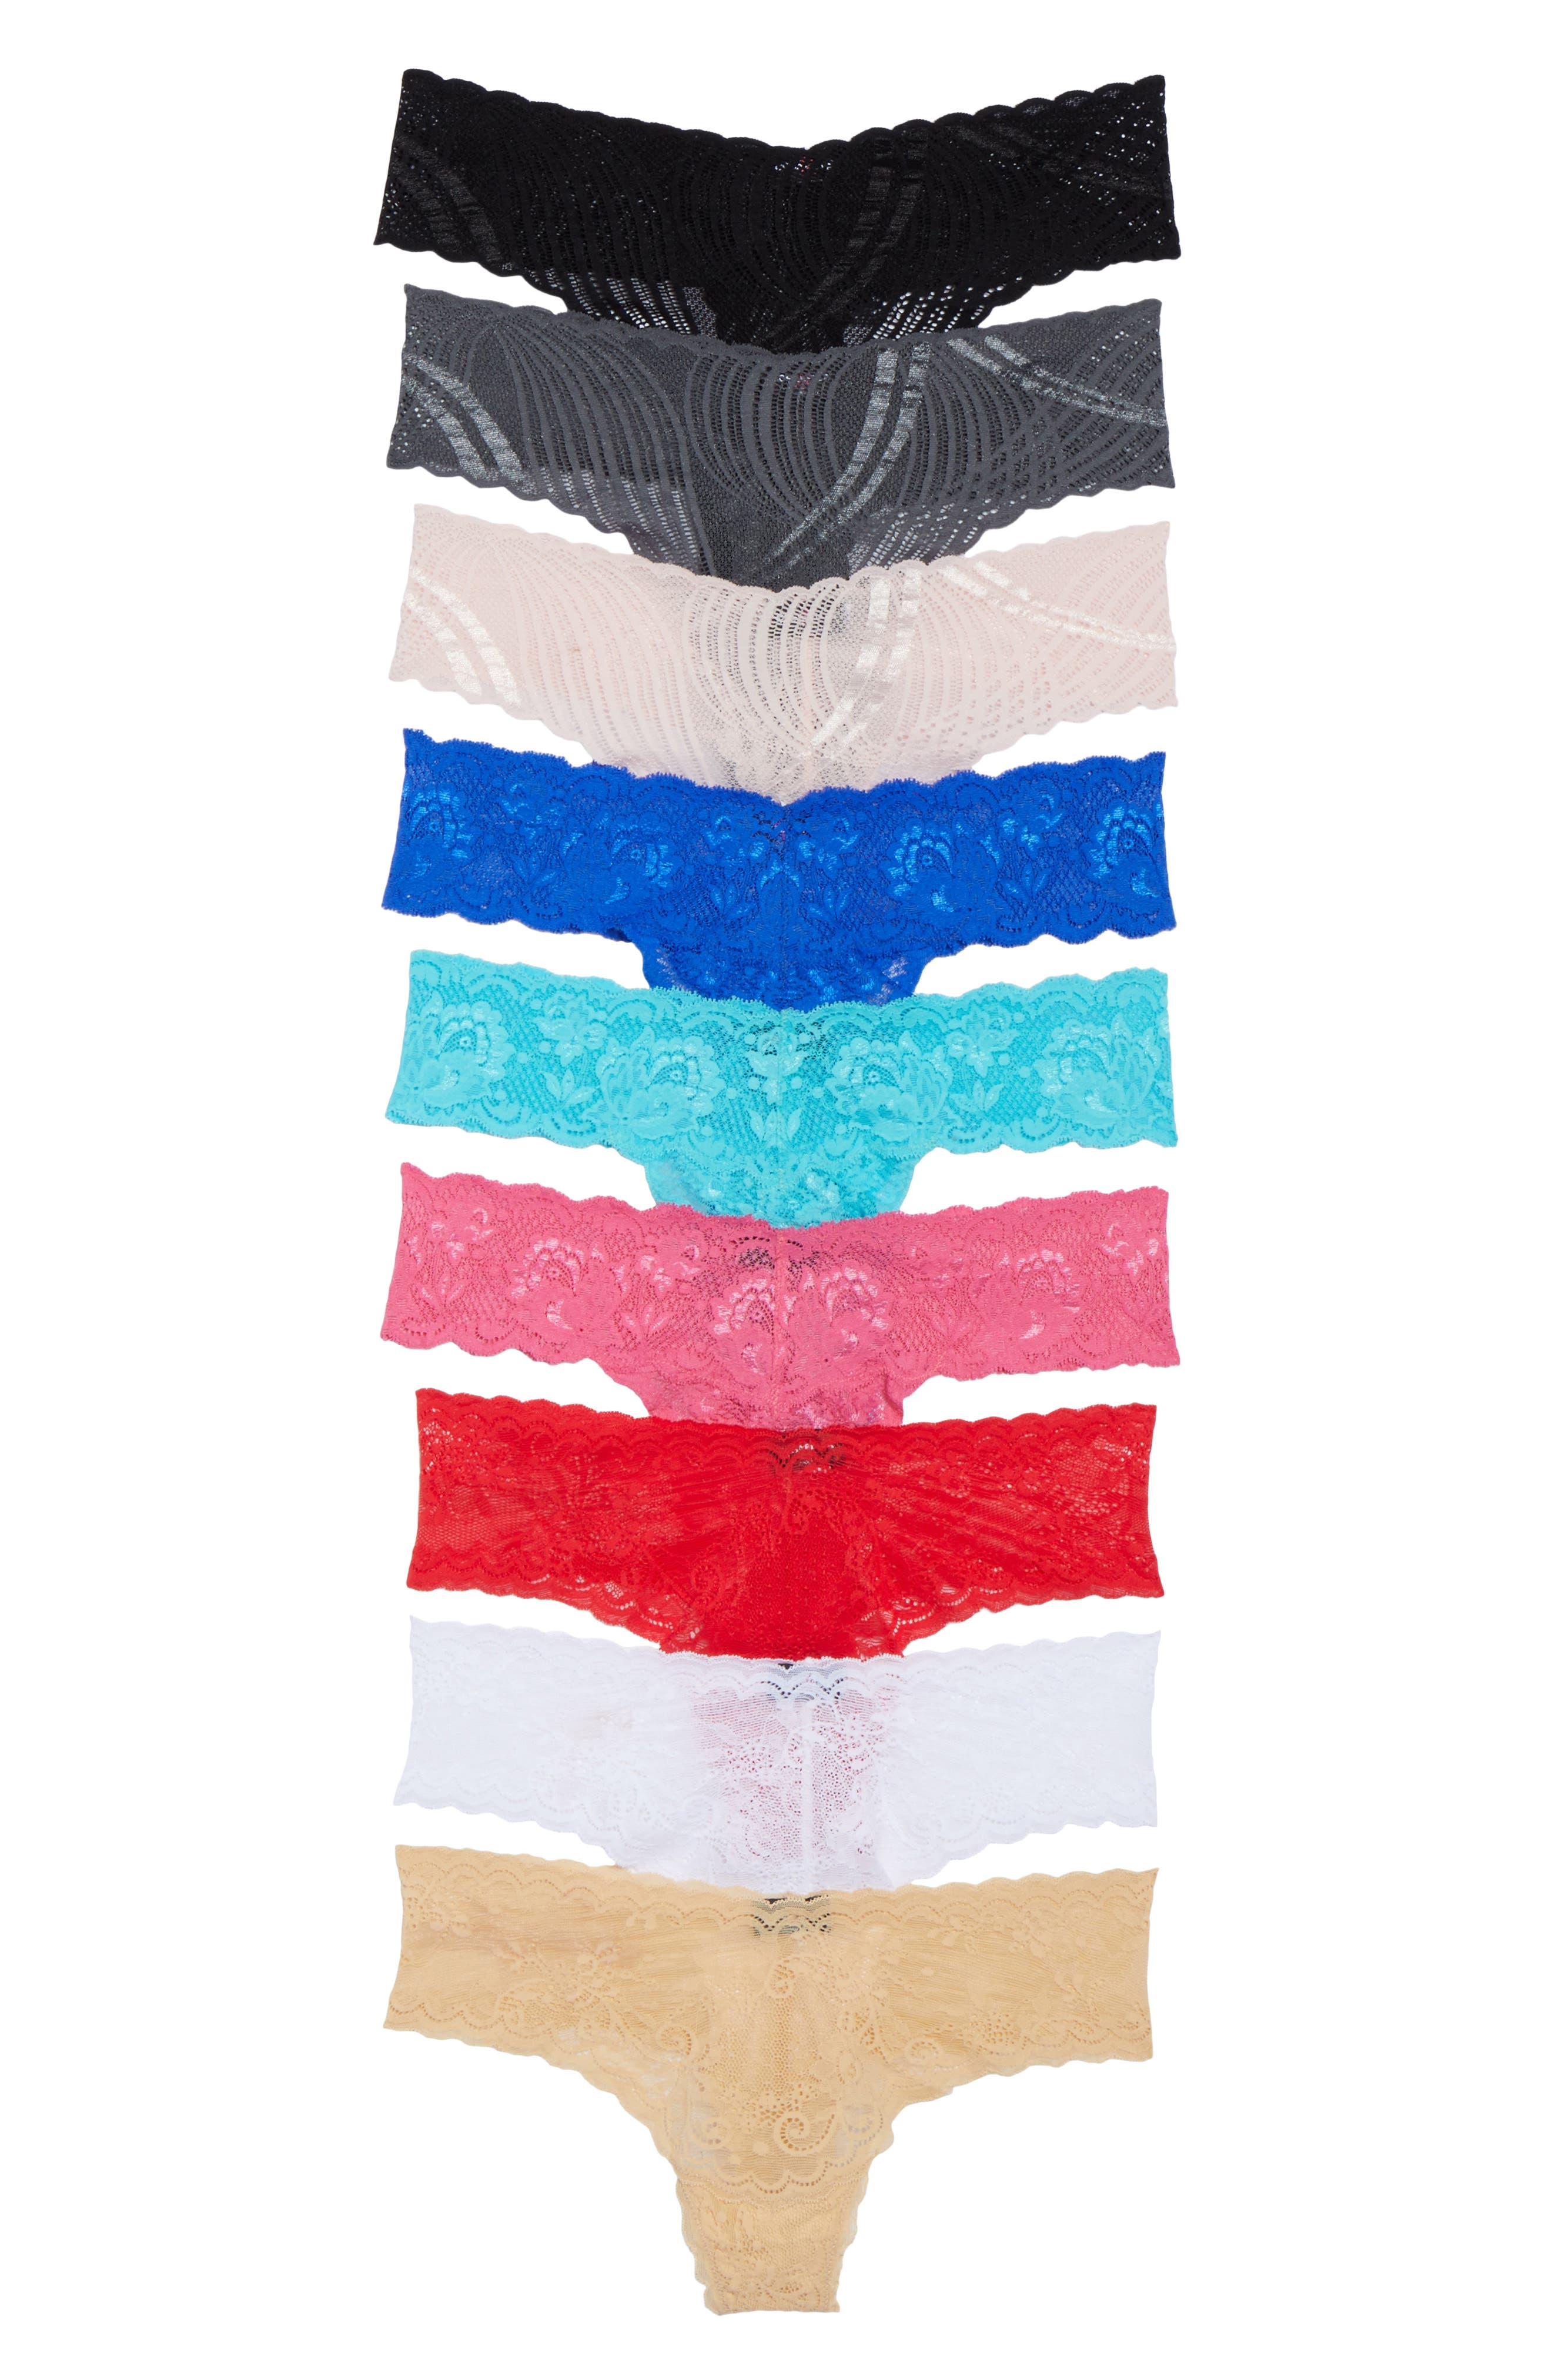 Box of Love 9-Pack Lace Thongs,                             Alternate thumbnail 2, color,                             Multi